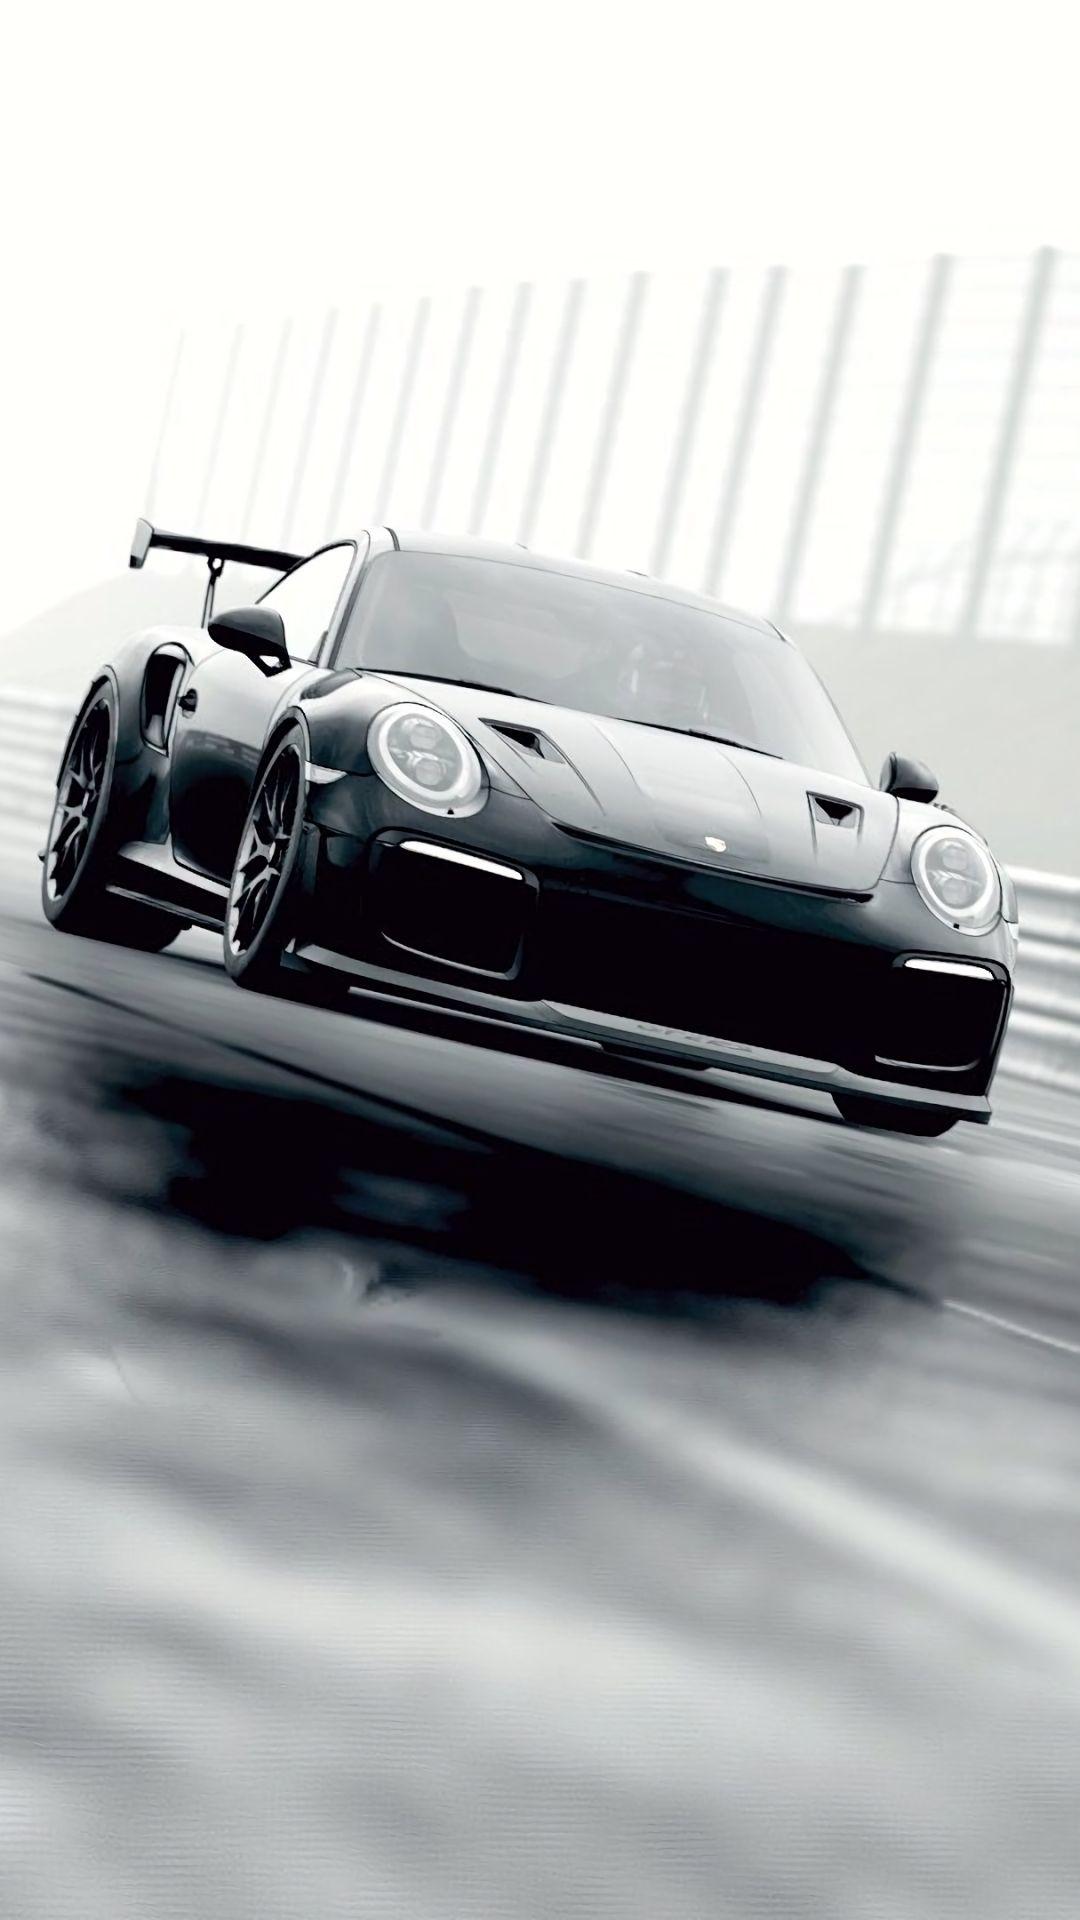 Vehicles Porsche 911 Gt2 1080x1920 Mobile Wallpaper Porsche 911 Gt2 Porsche 911 Porsche